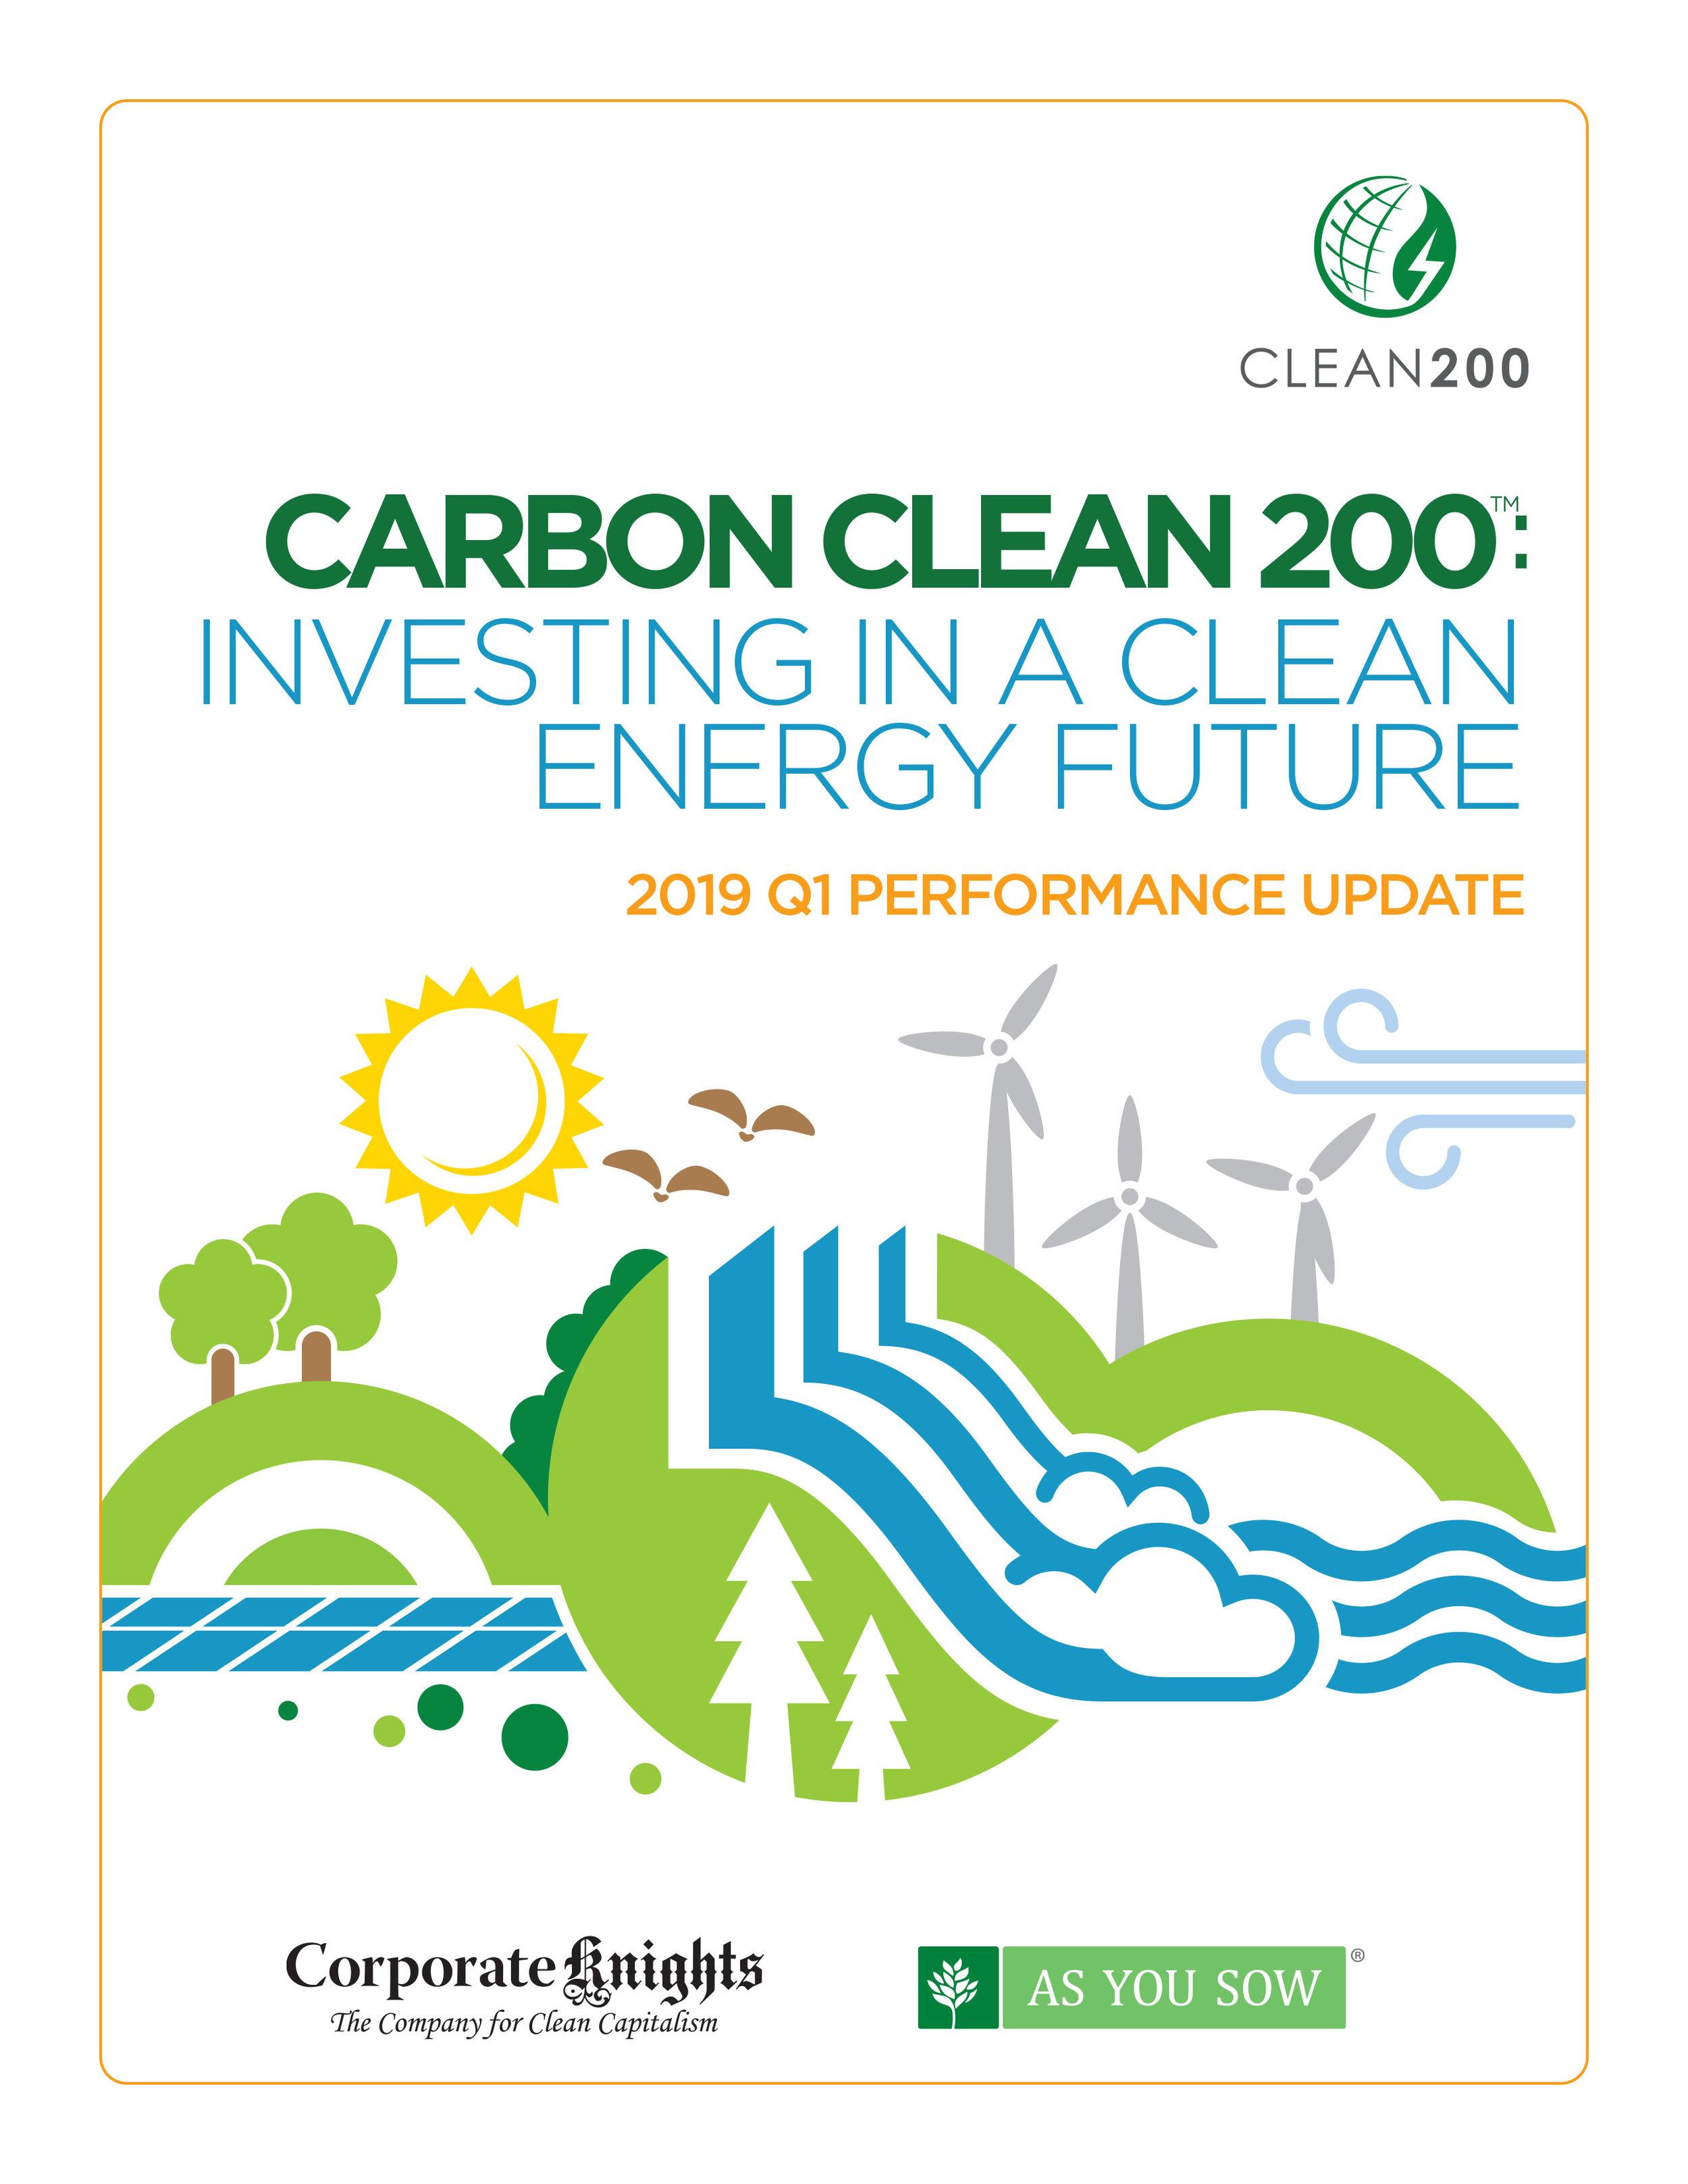 AYS_CarbonClean200_Cover-2019Q1 2.jpg